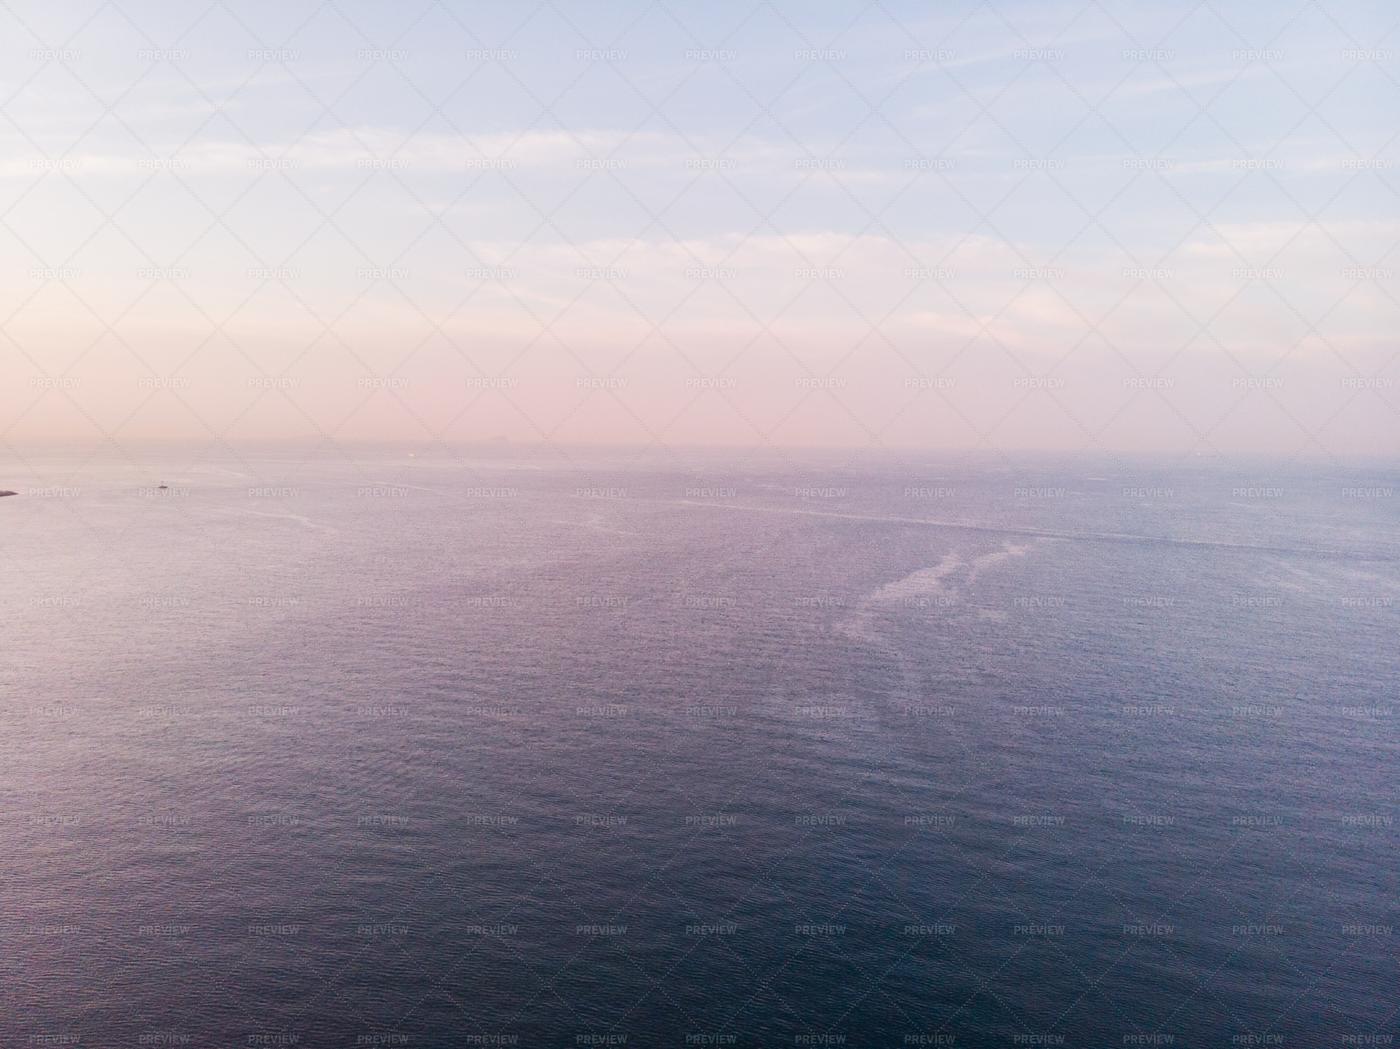 Ocean And Cloudy Sky Background: Stock Photos